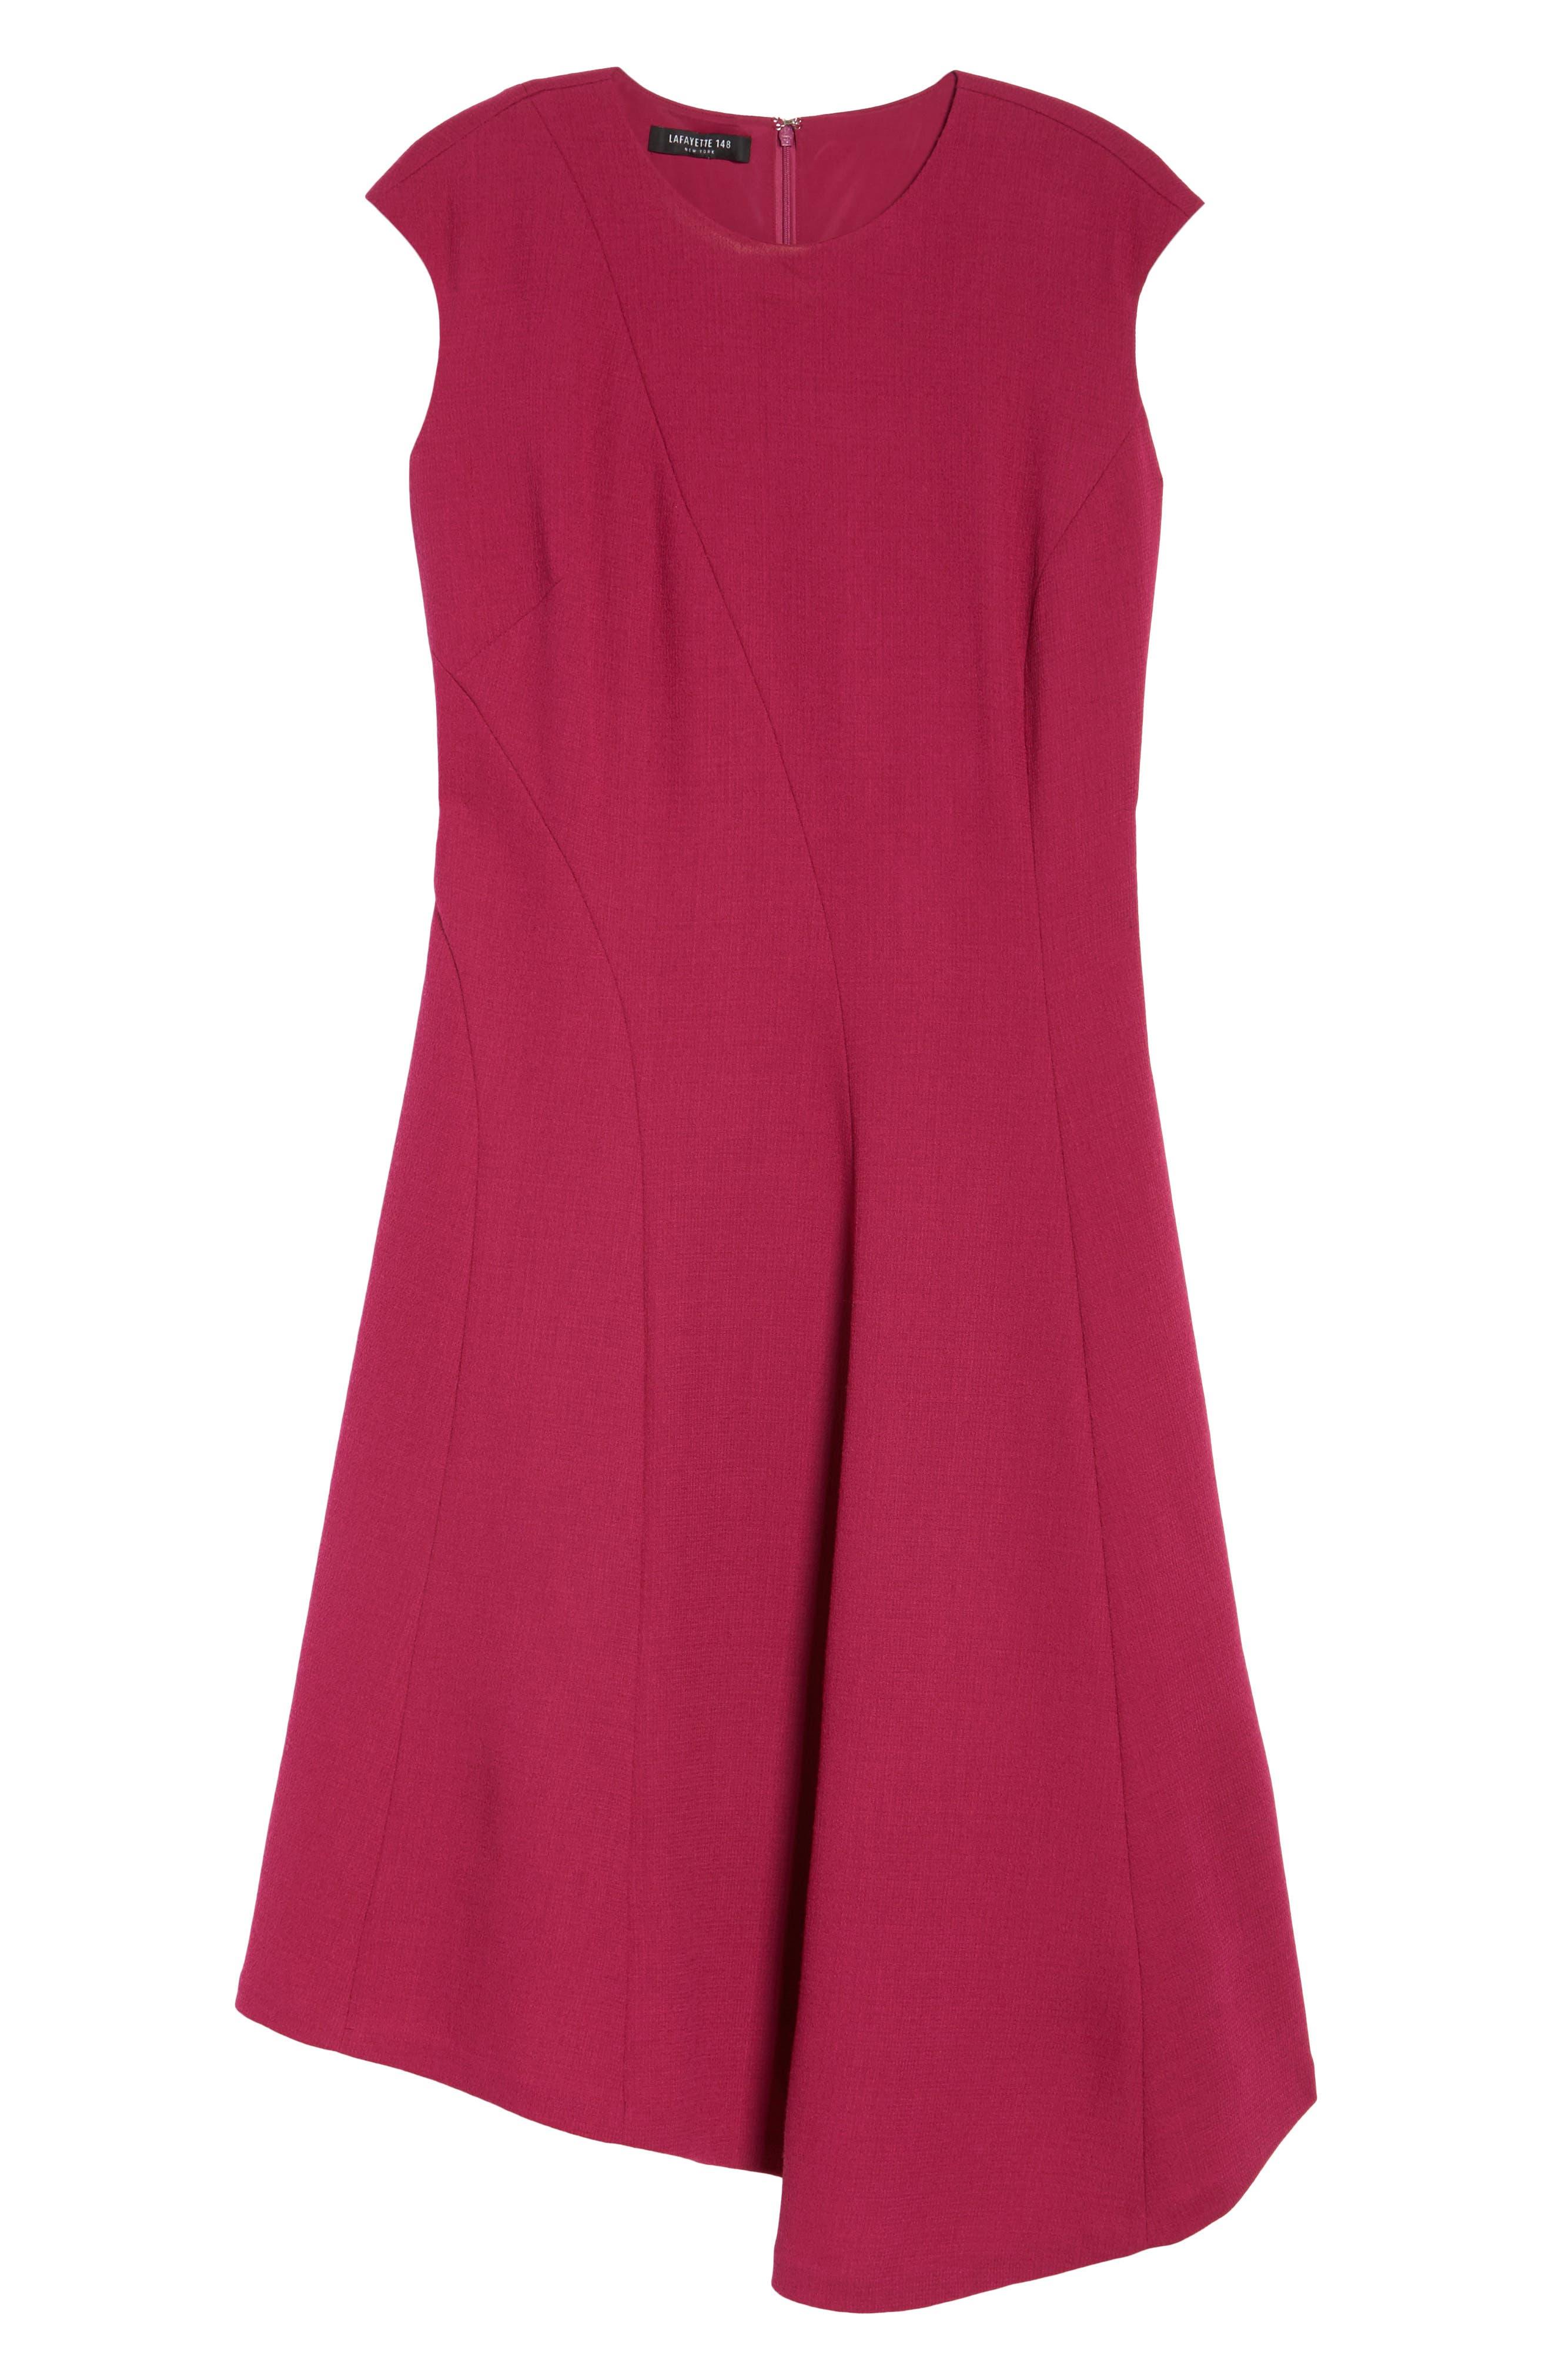 Aveena Wool Interlock Dress,                             Alternate thumbnail 6, color,                             651